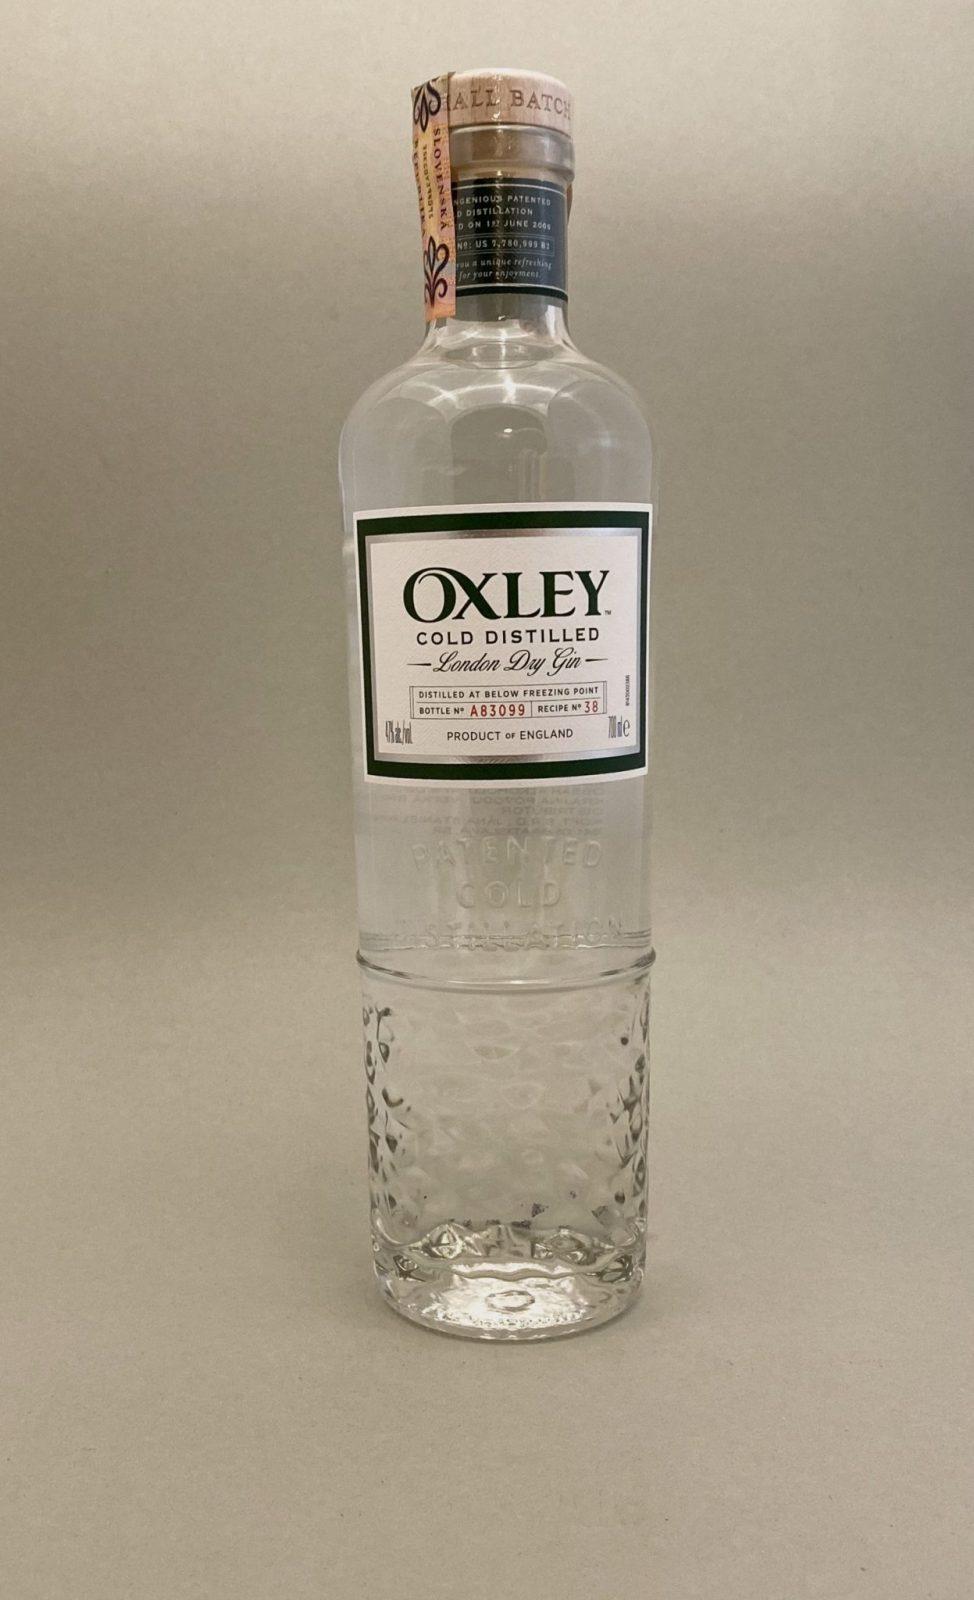 Oxley Gin 47%, Bottleshop Sunny wines slnecnice mesto, petrzalka, Gin, rozvoz alkoholu, eshop